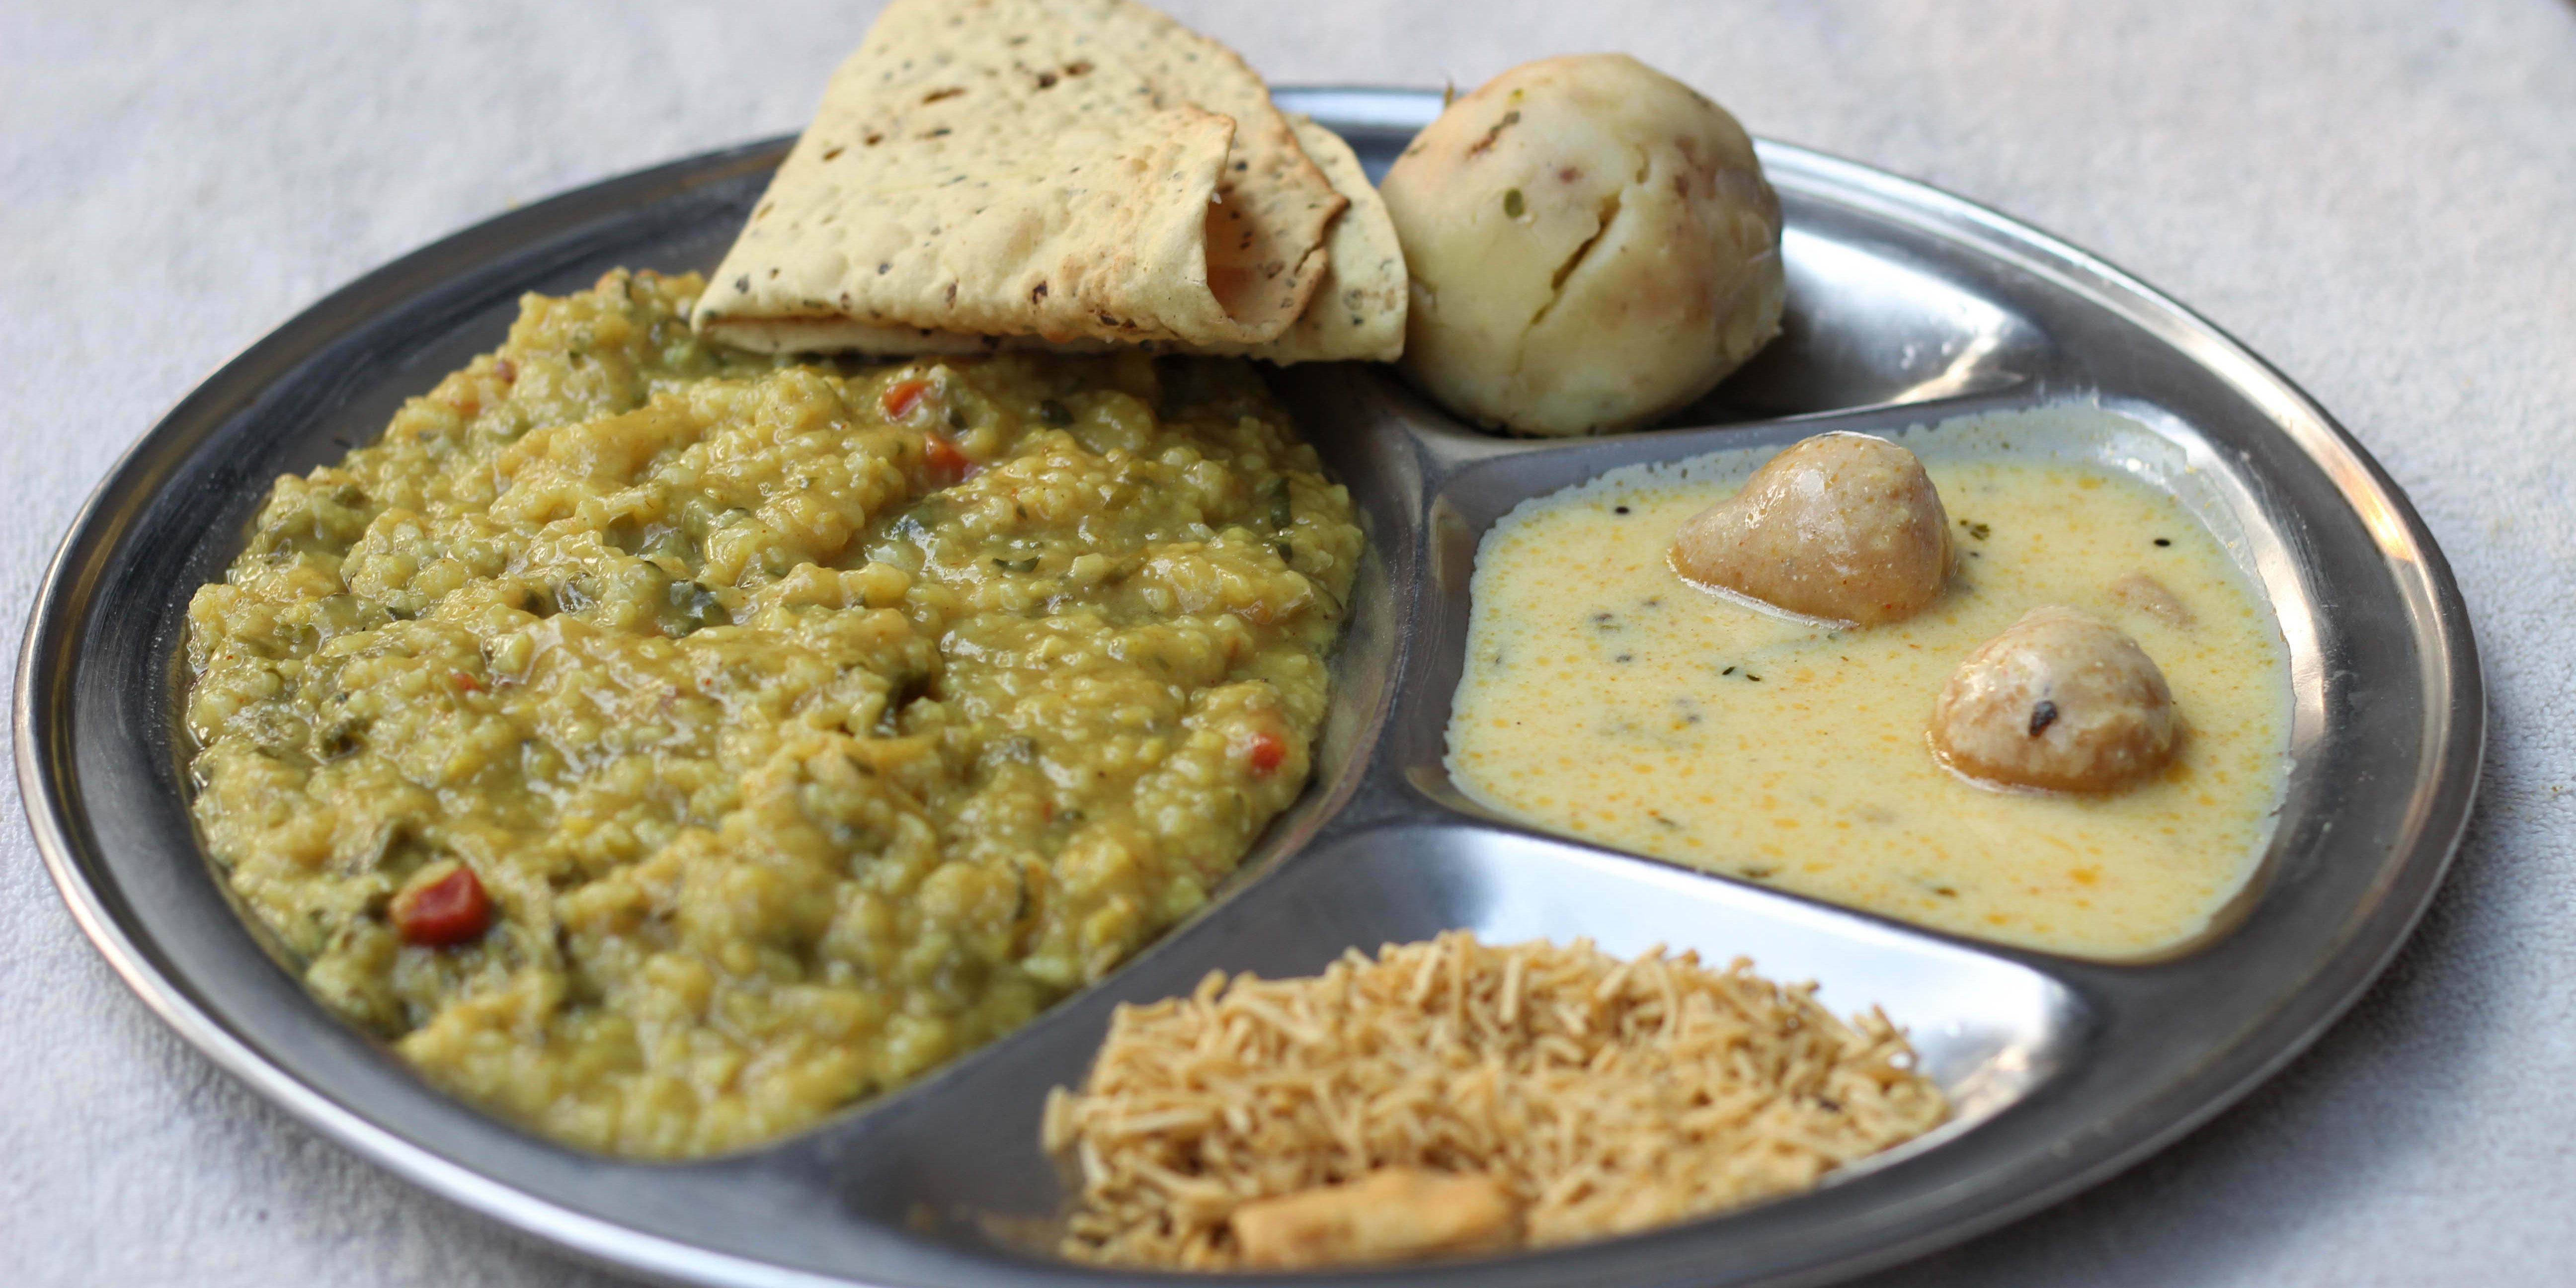 Pooja Snacks   Home delivery   Order online   Near Girish Park